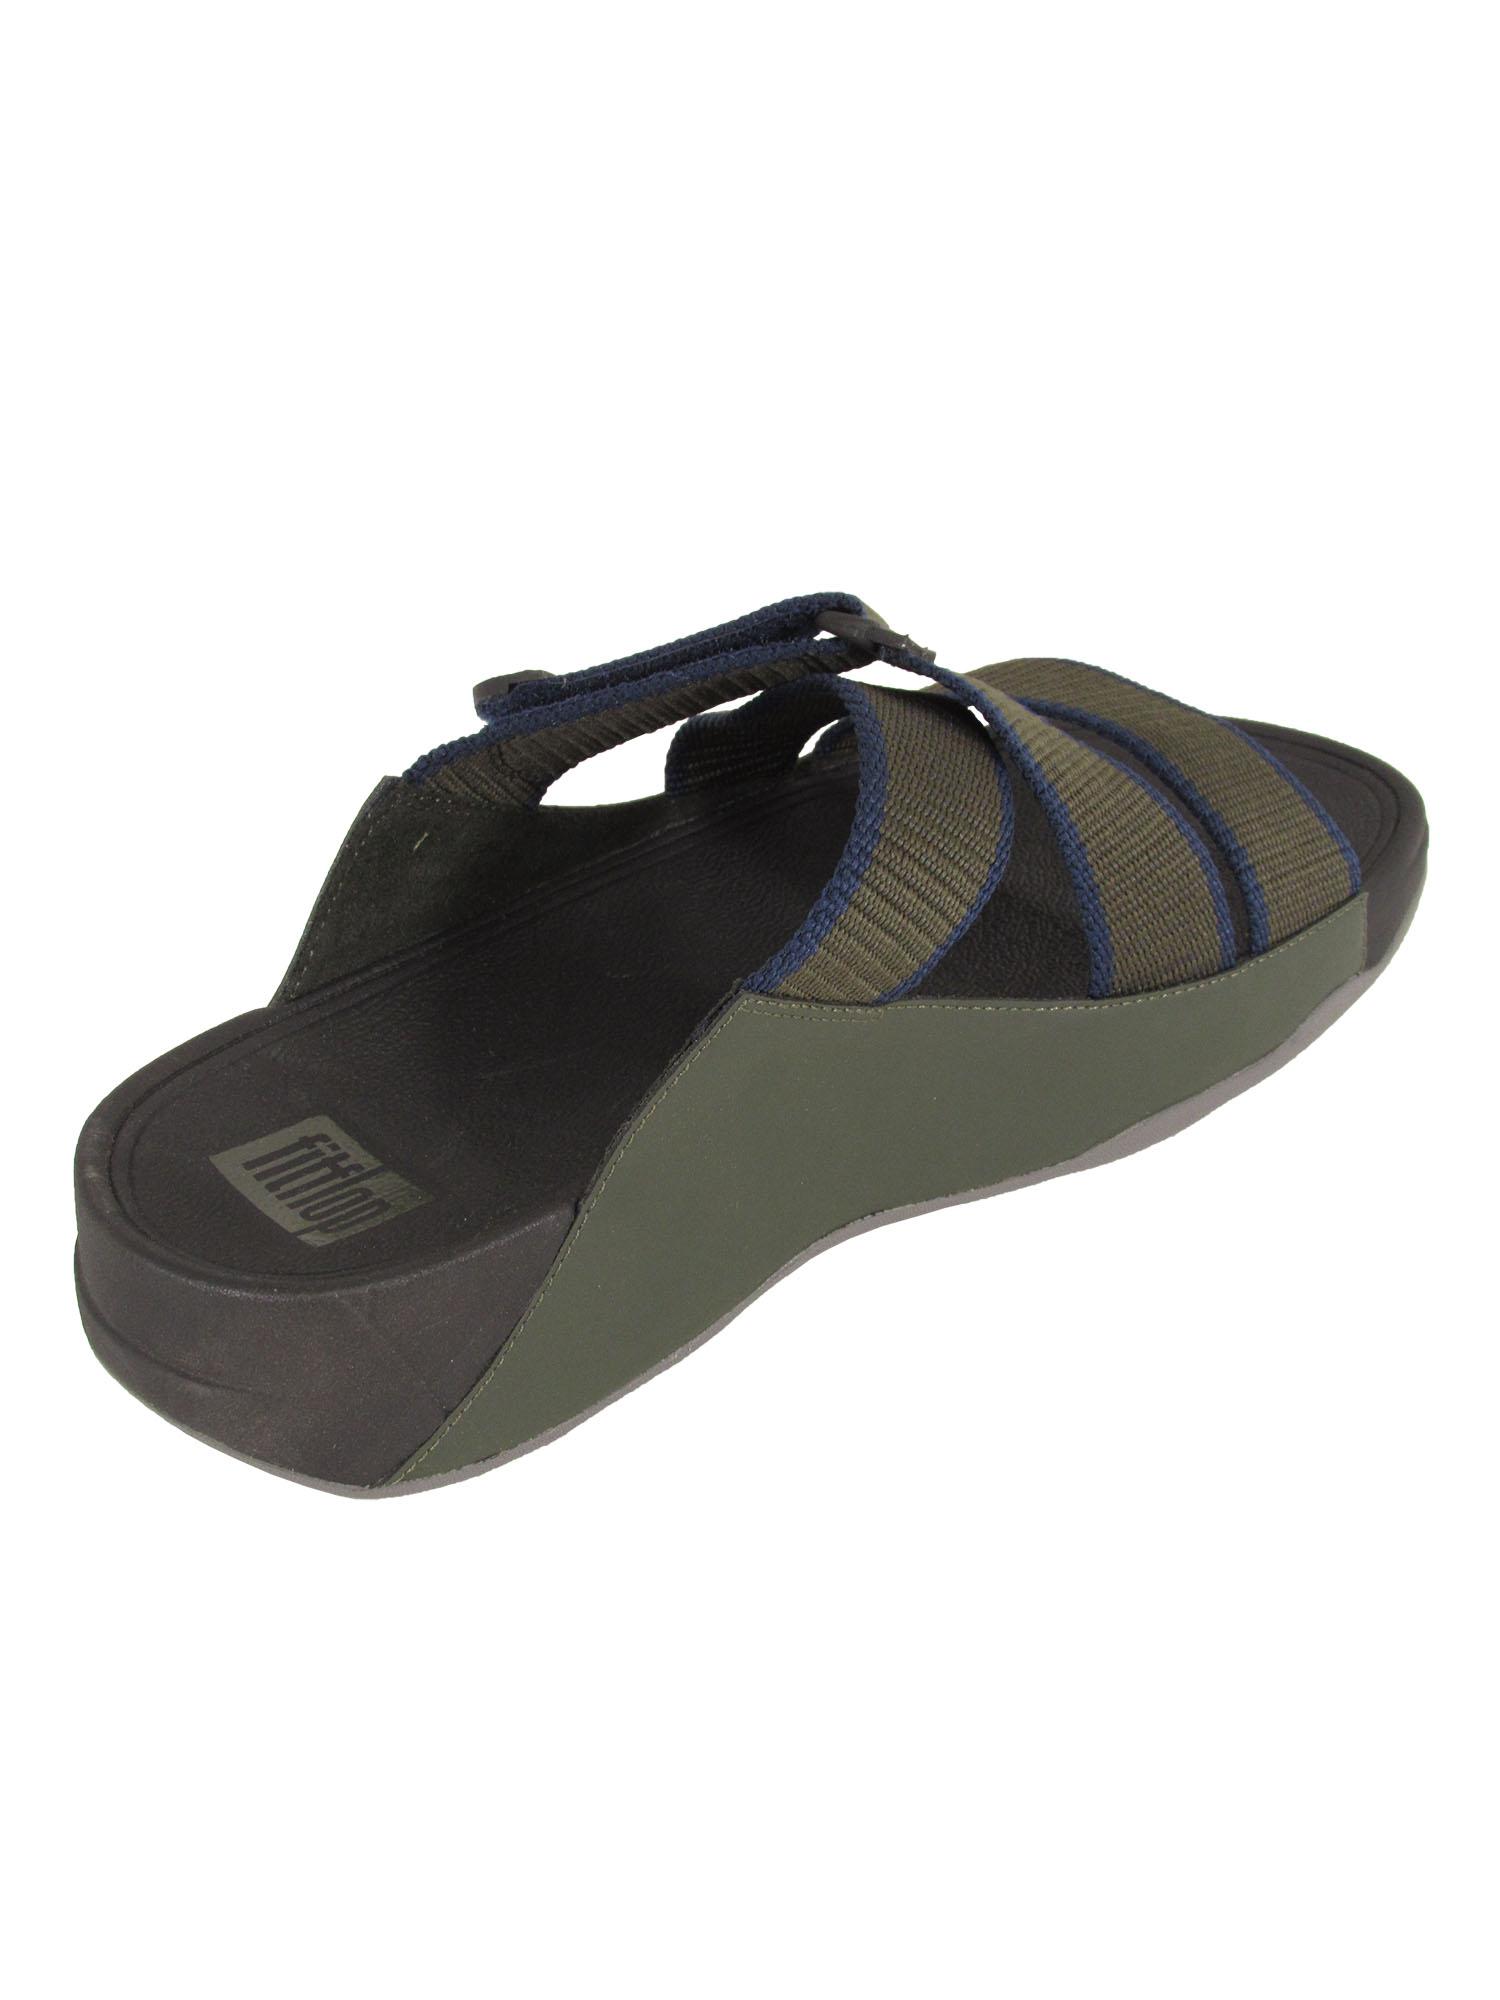 Fitflop-Mens-Sling-II-Webbing-Slide-Sandals thumbnail 7